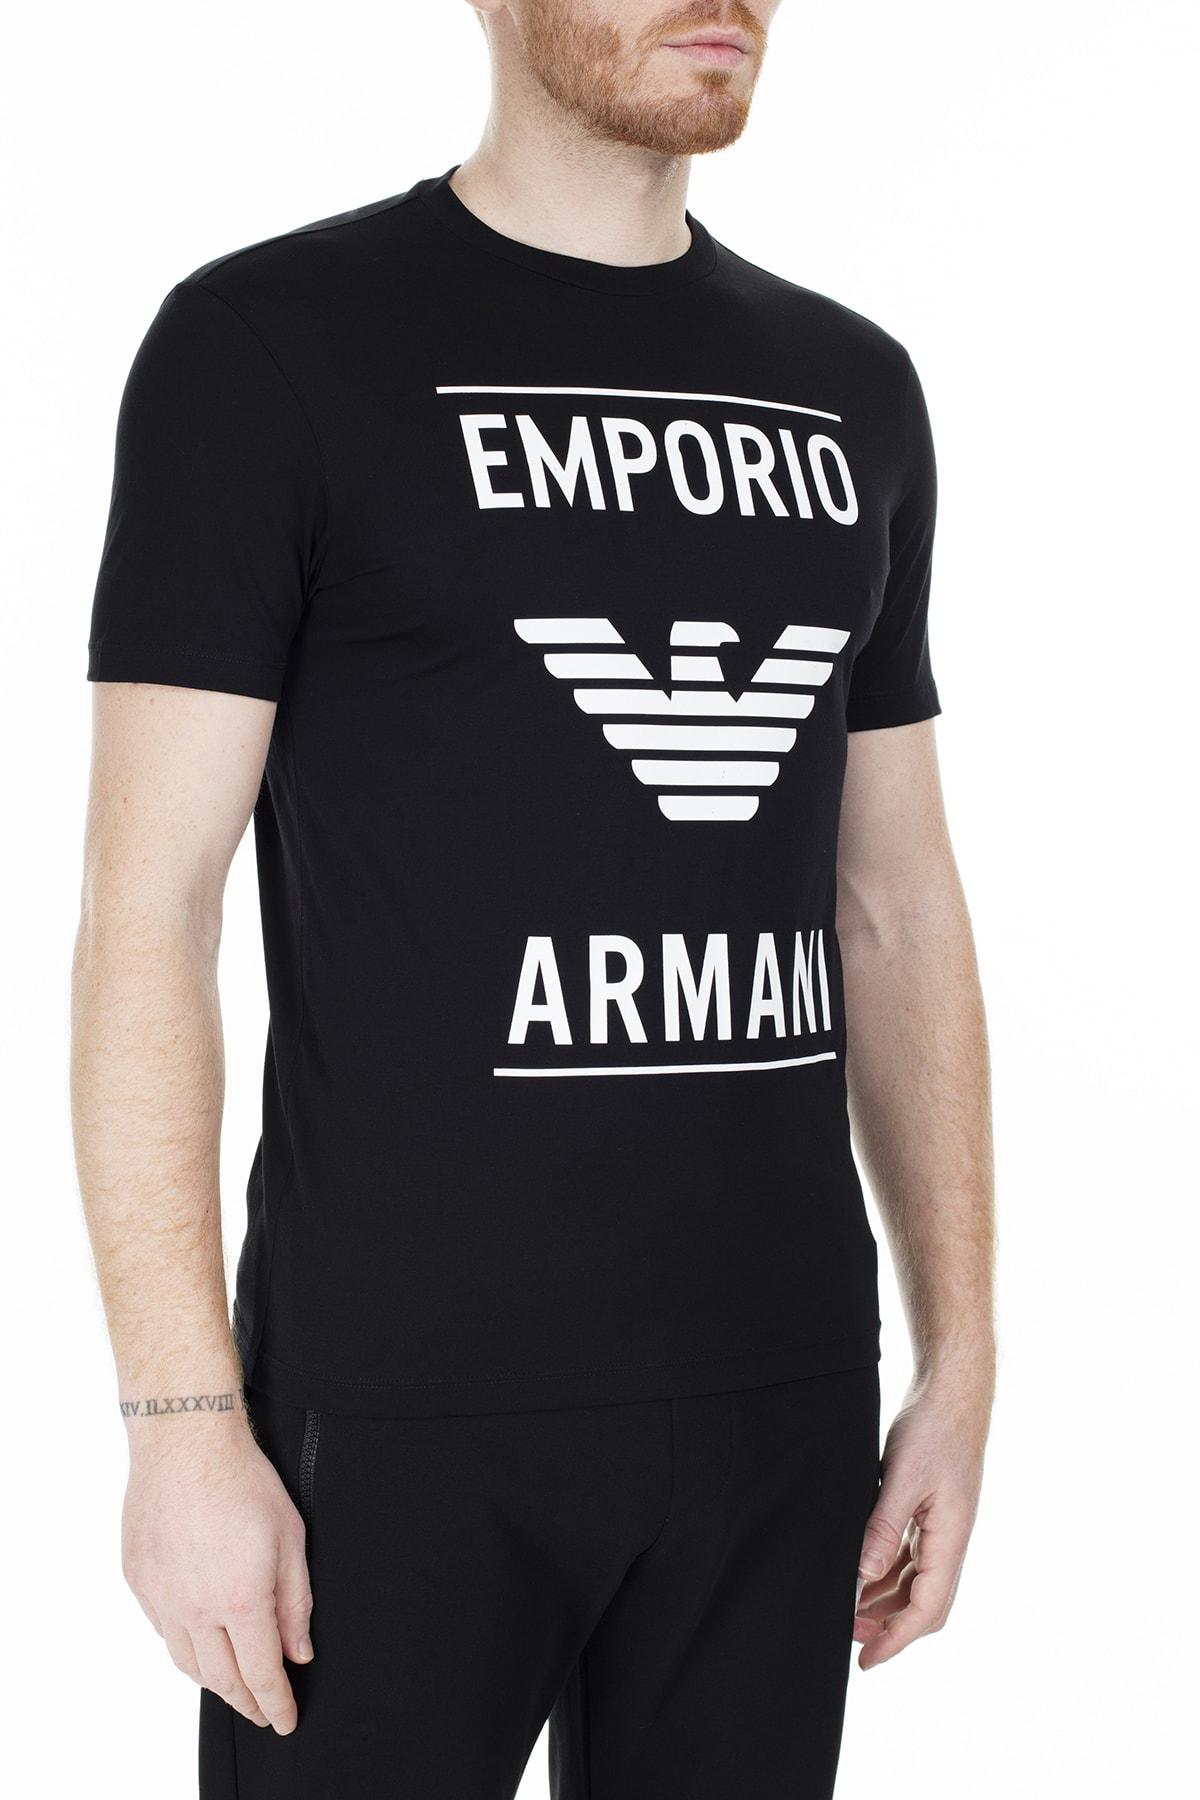 Emporio Armani T Shirt Erkek T Shirt S 6G1Te7 1Jnqz 0999 S 6G1TE7 1JNQZ 0999 3